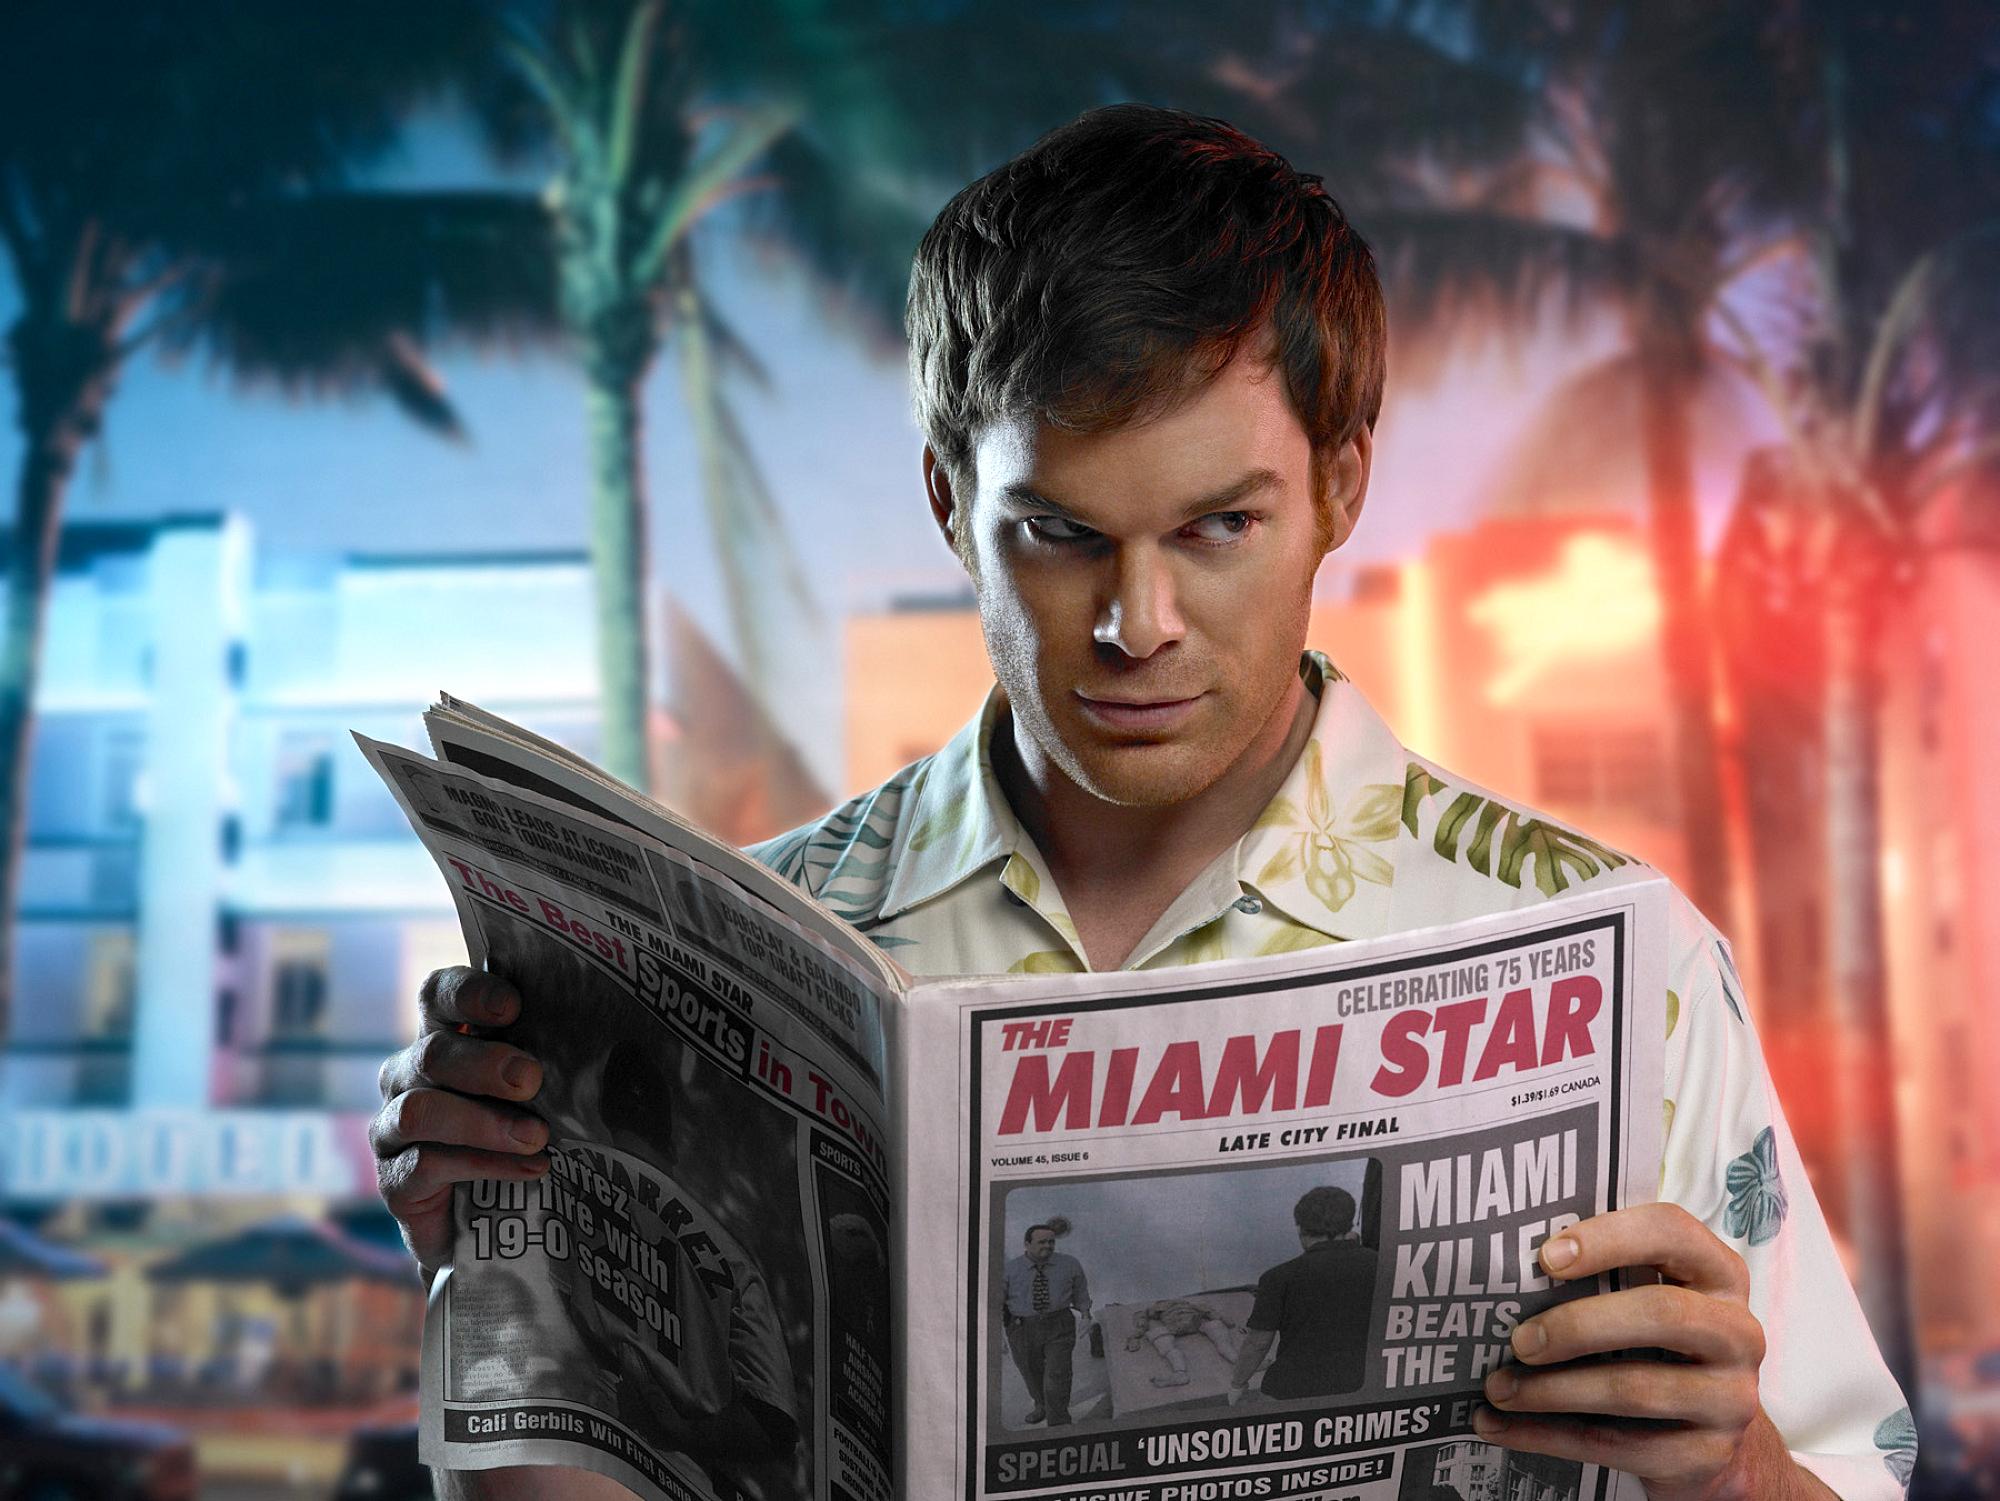 Televisieprogramma - Dexter  Michael C. Hall Dexter Morgan Wallpaper